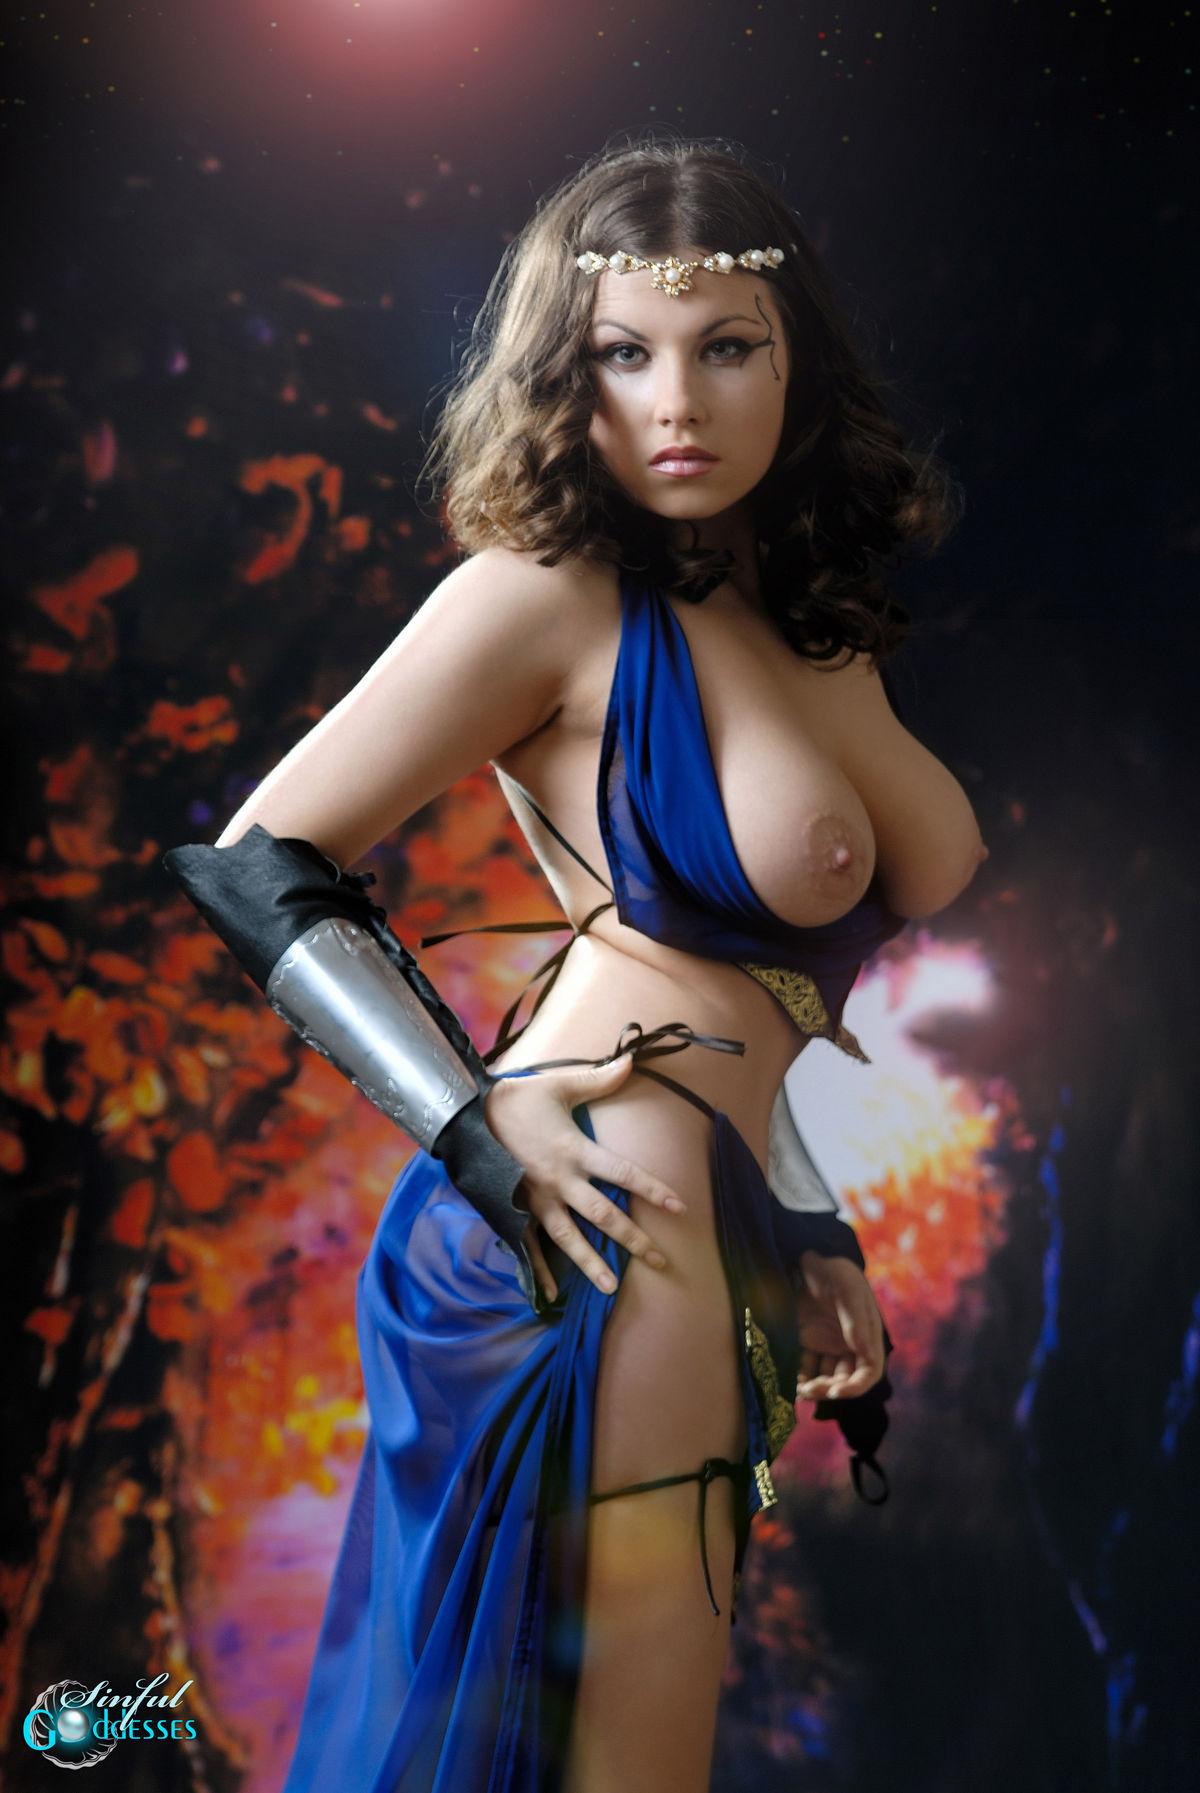 sex pussy of rihanna